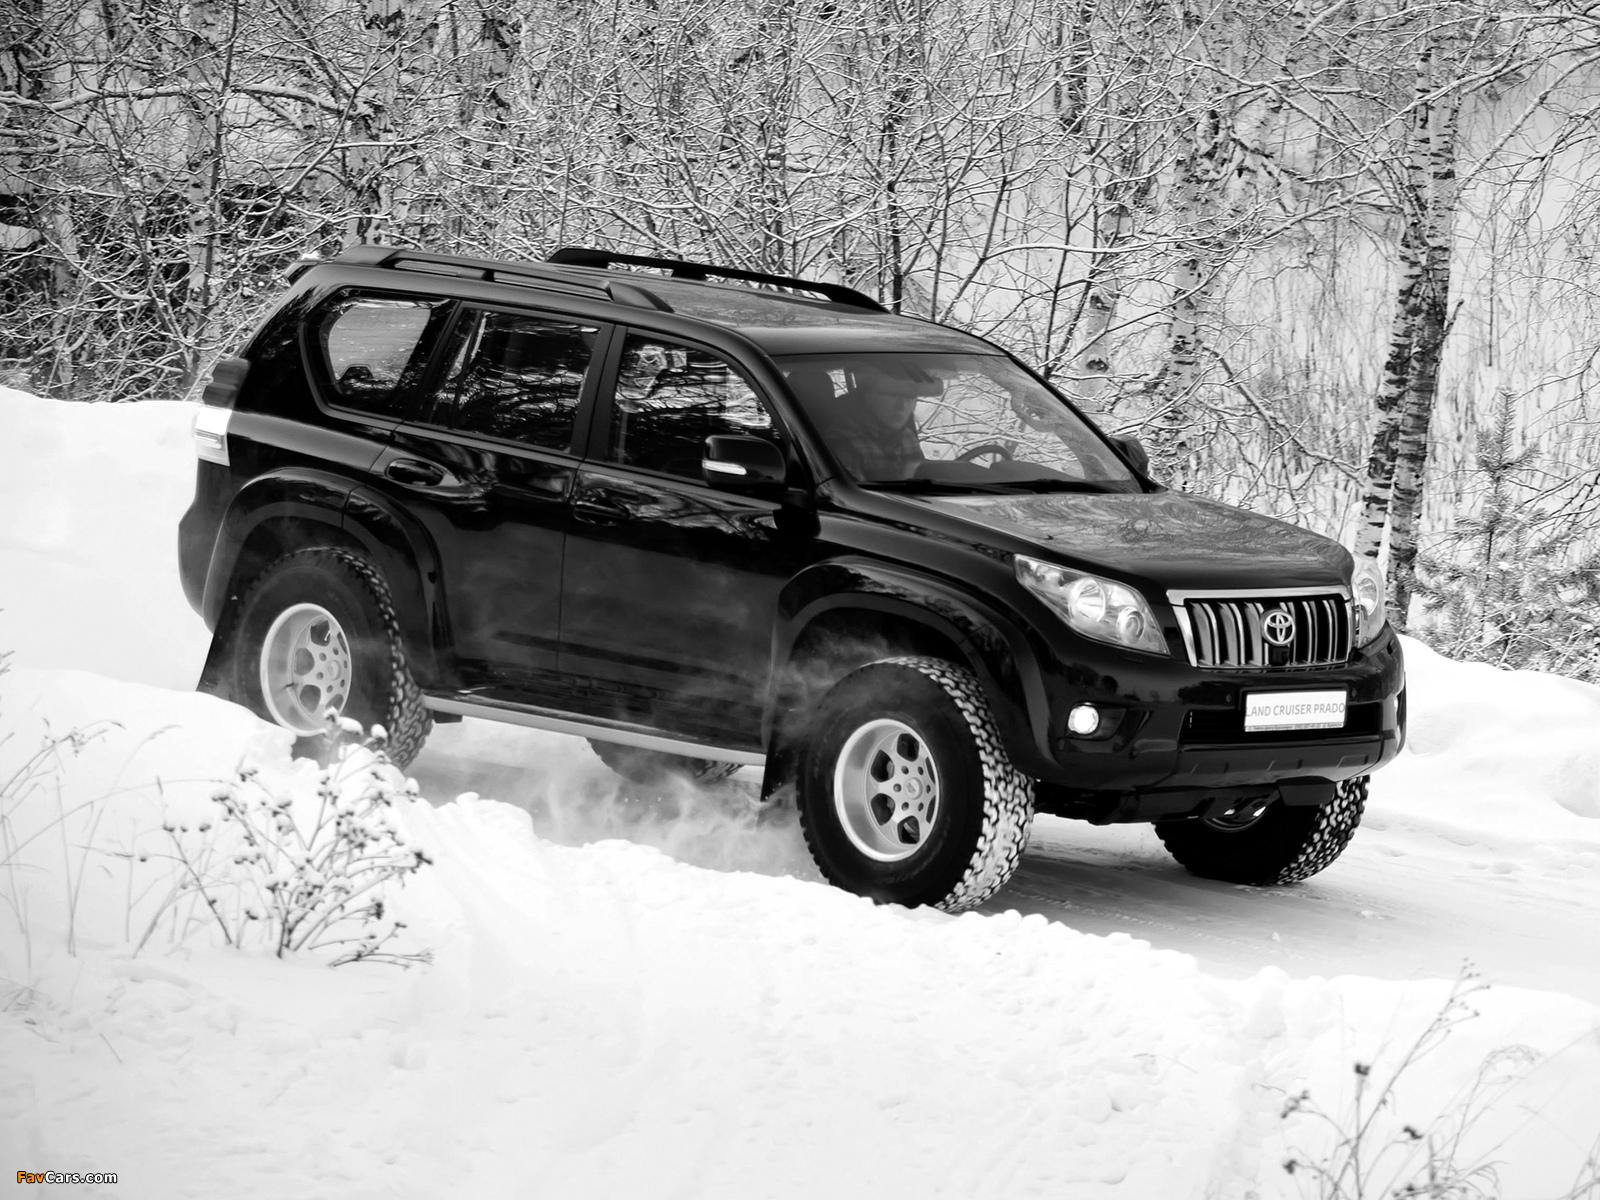 Arctic Trucks Toyota Land Cruiser Prado - WheelsAge.org